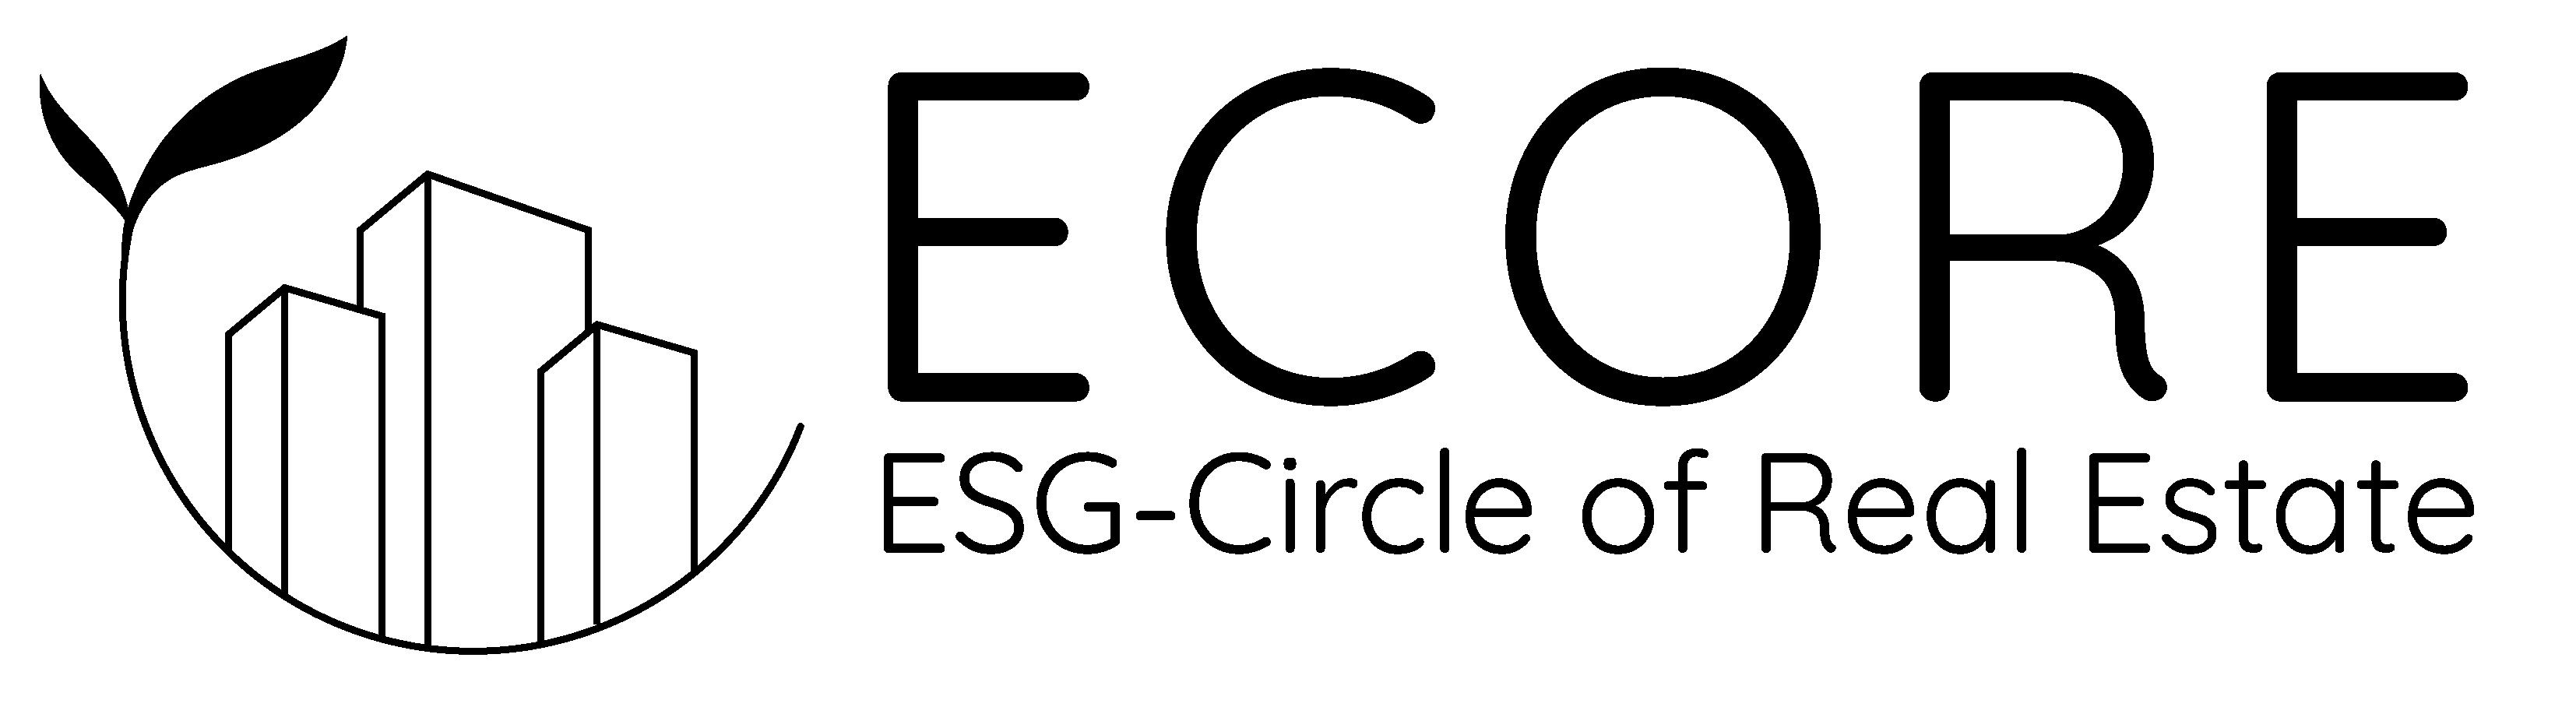 Ecore logo black bg transparent